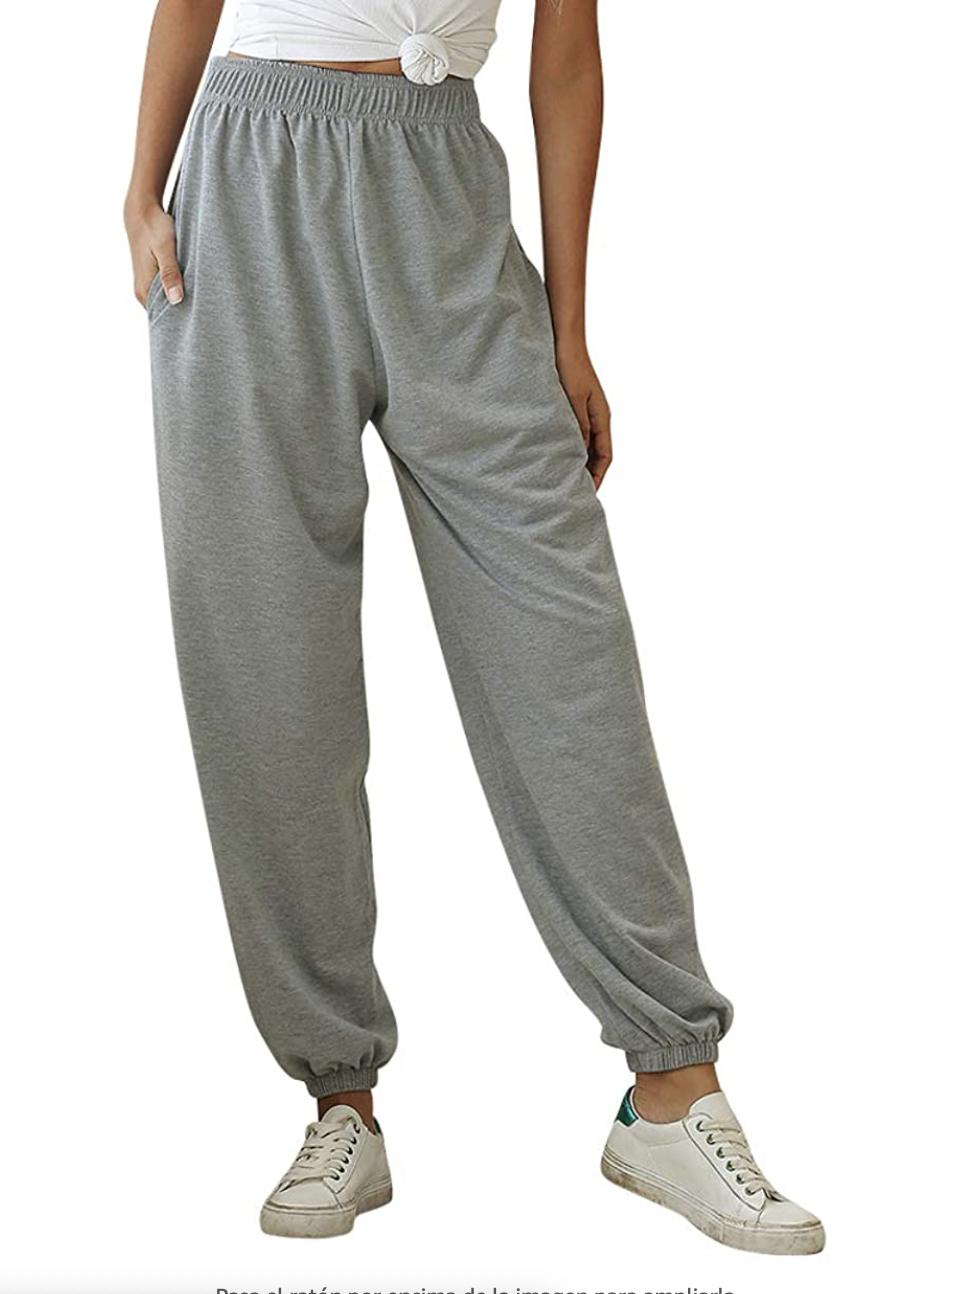 Nuofengkudu Mujer Harem Pantalones Jogging con Bolsillos Elastica Cintura Alta Comodo Llanura Largos Pantalón Deportiva Jogger Pants Sweatpants Casual Ropa de Casa